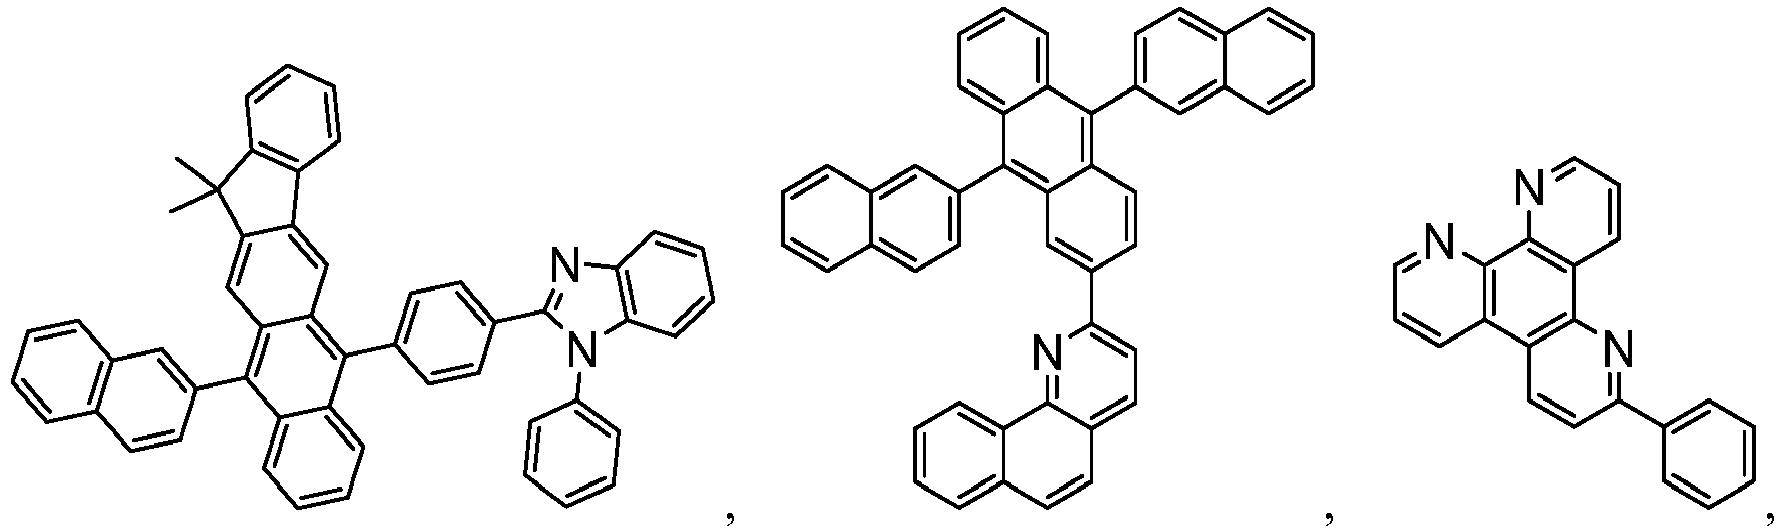 Figure imgb0948